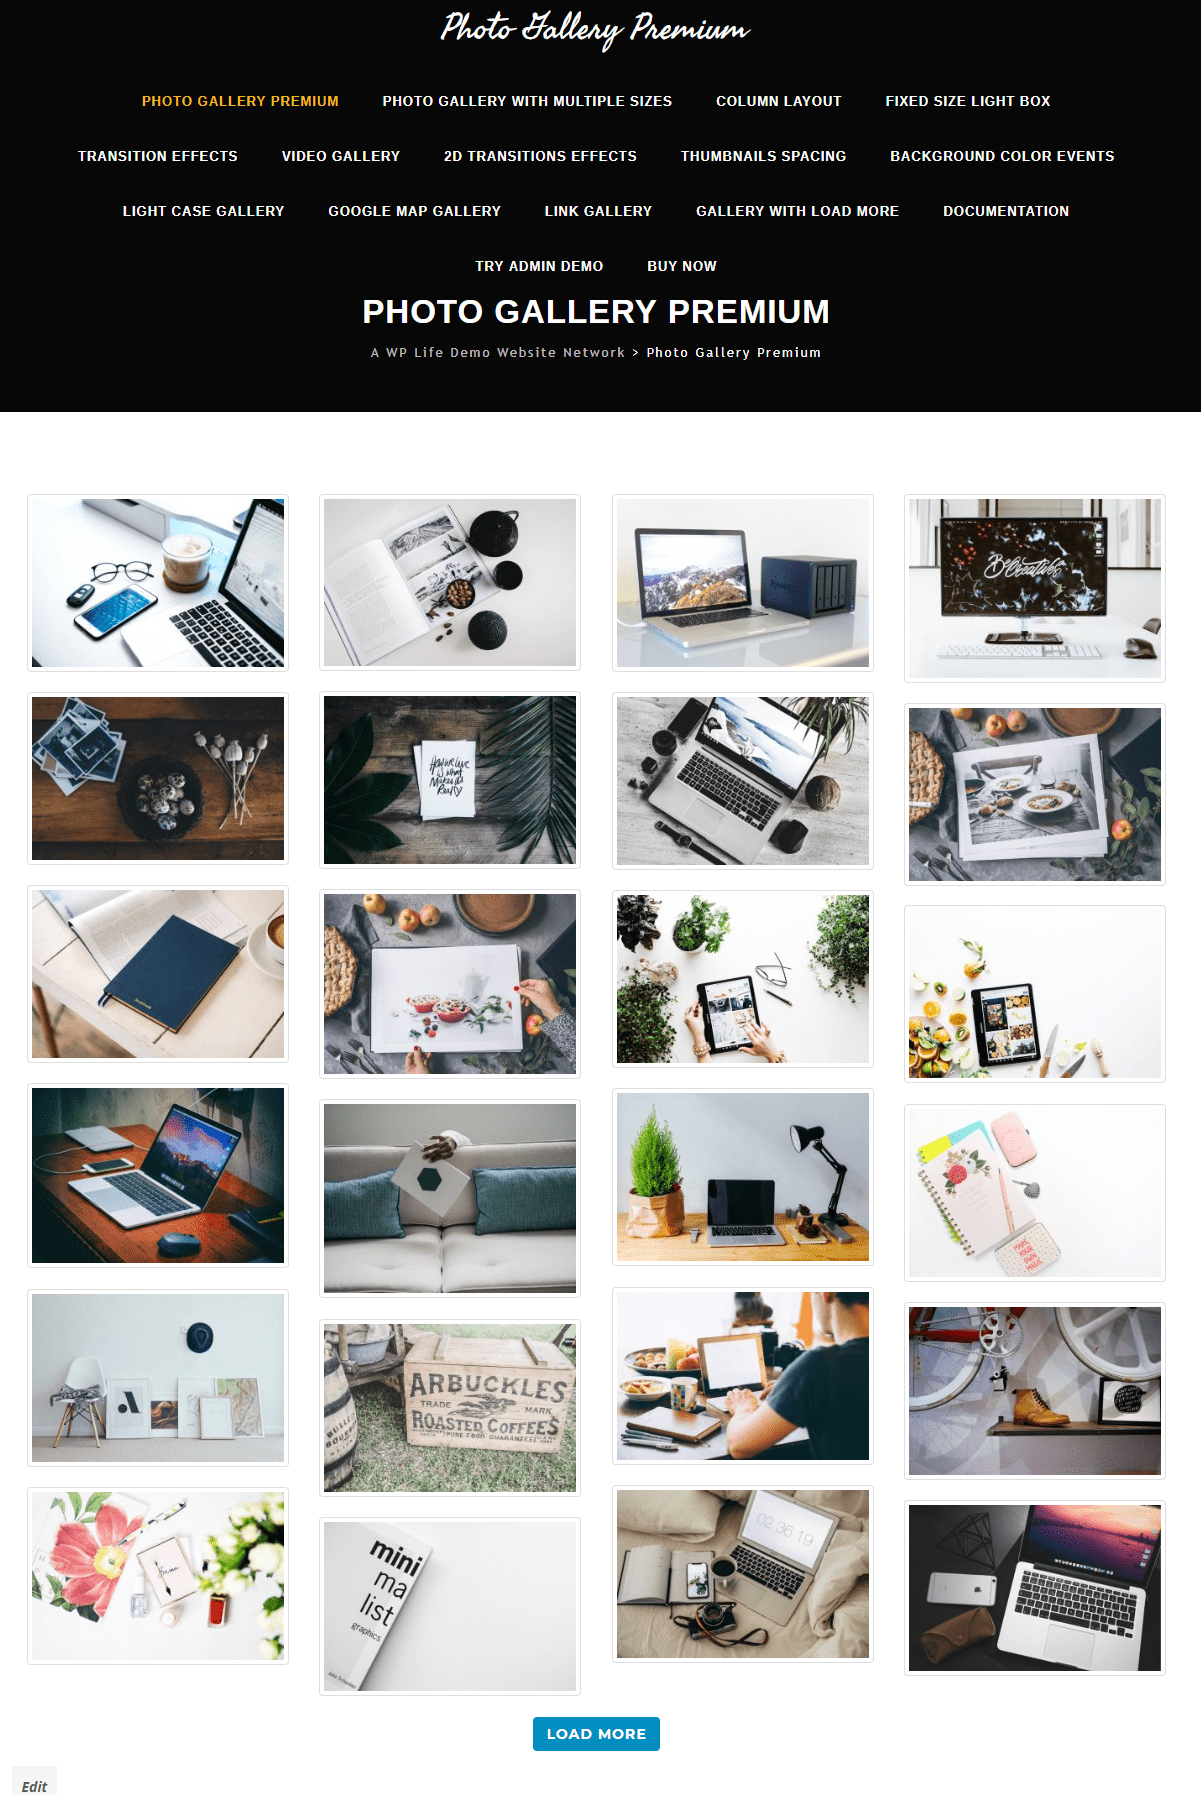 Photo gallery premium